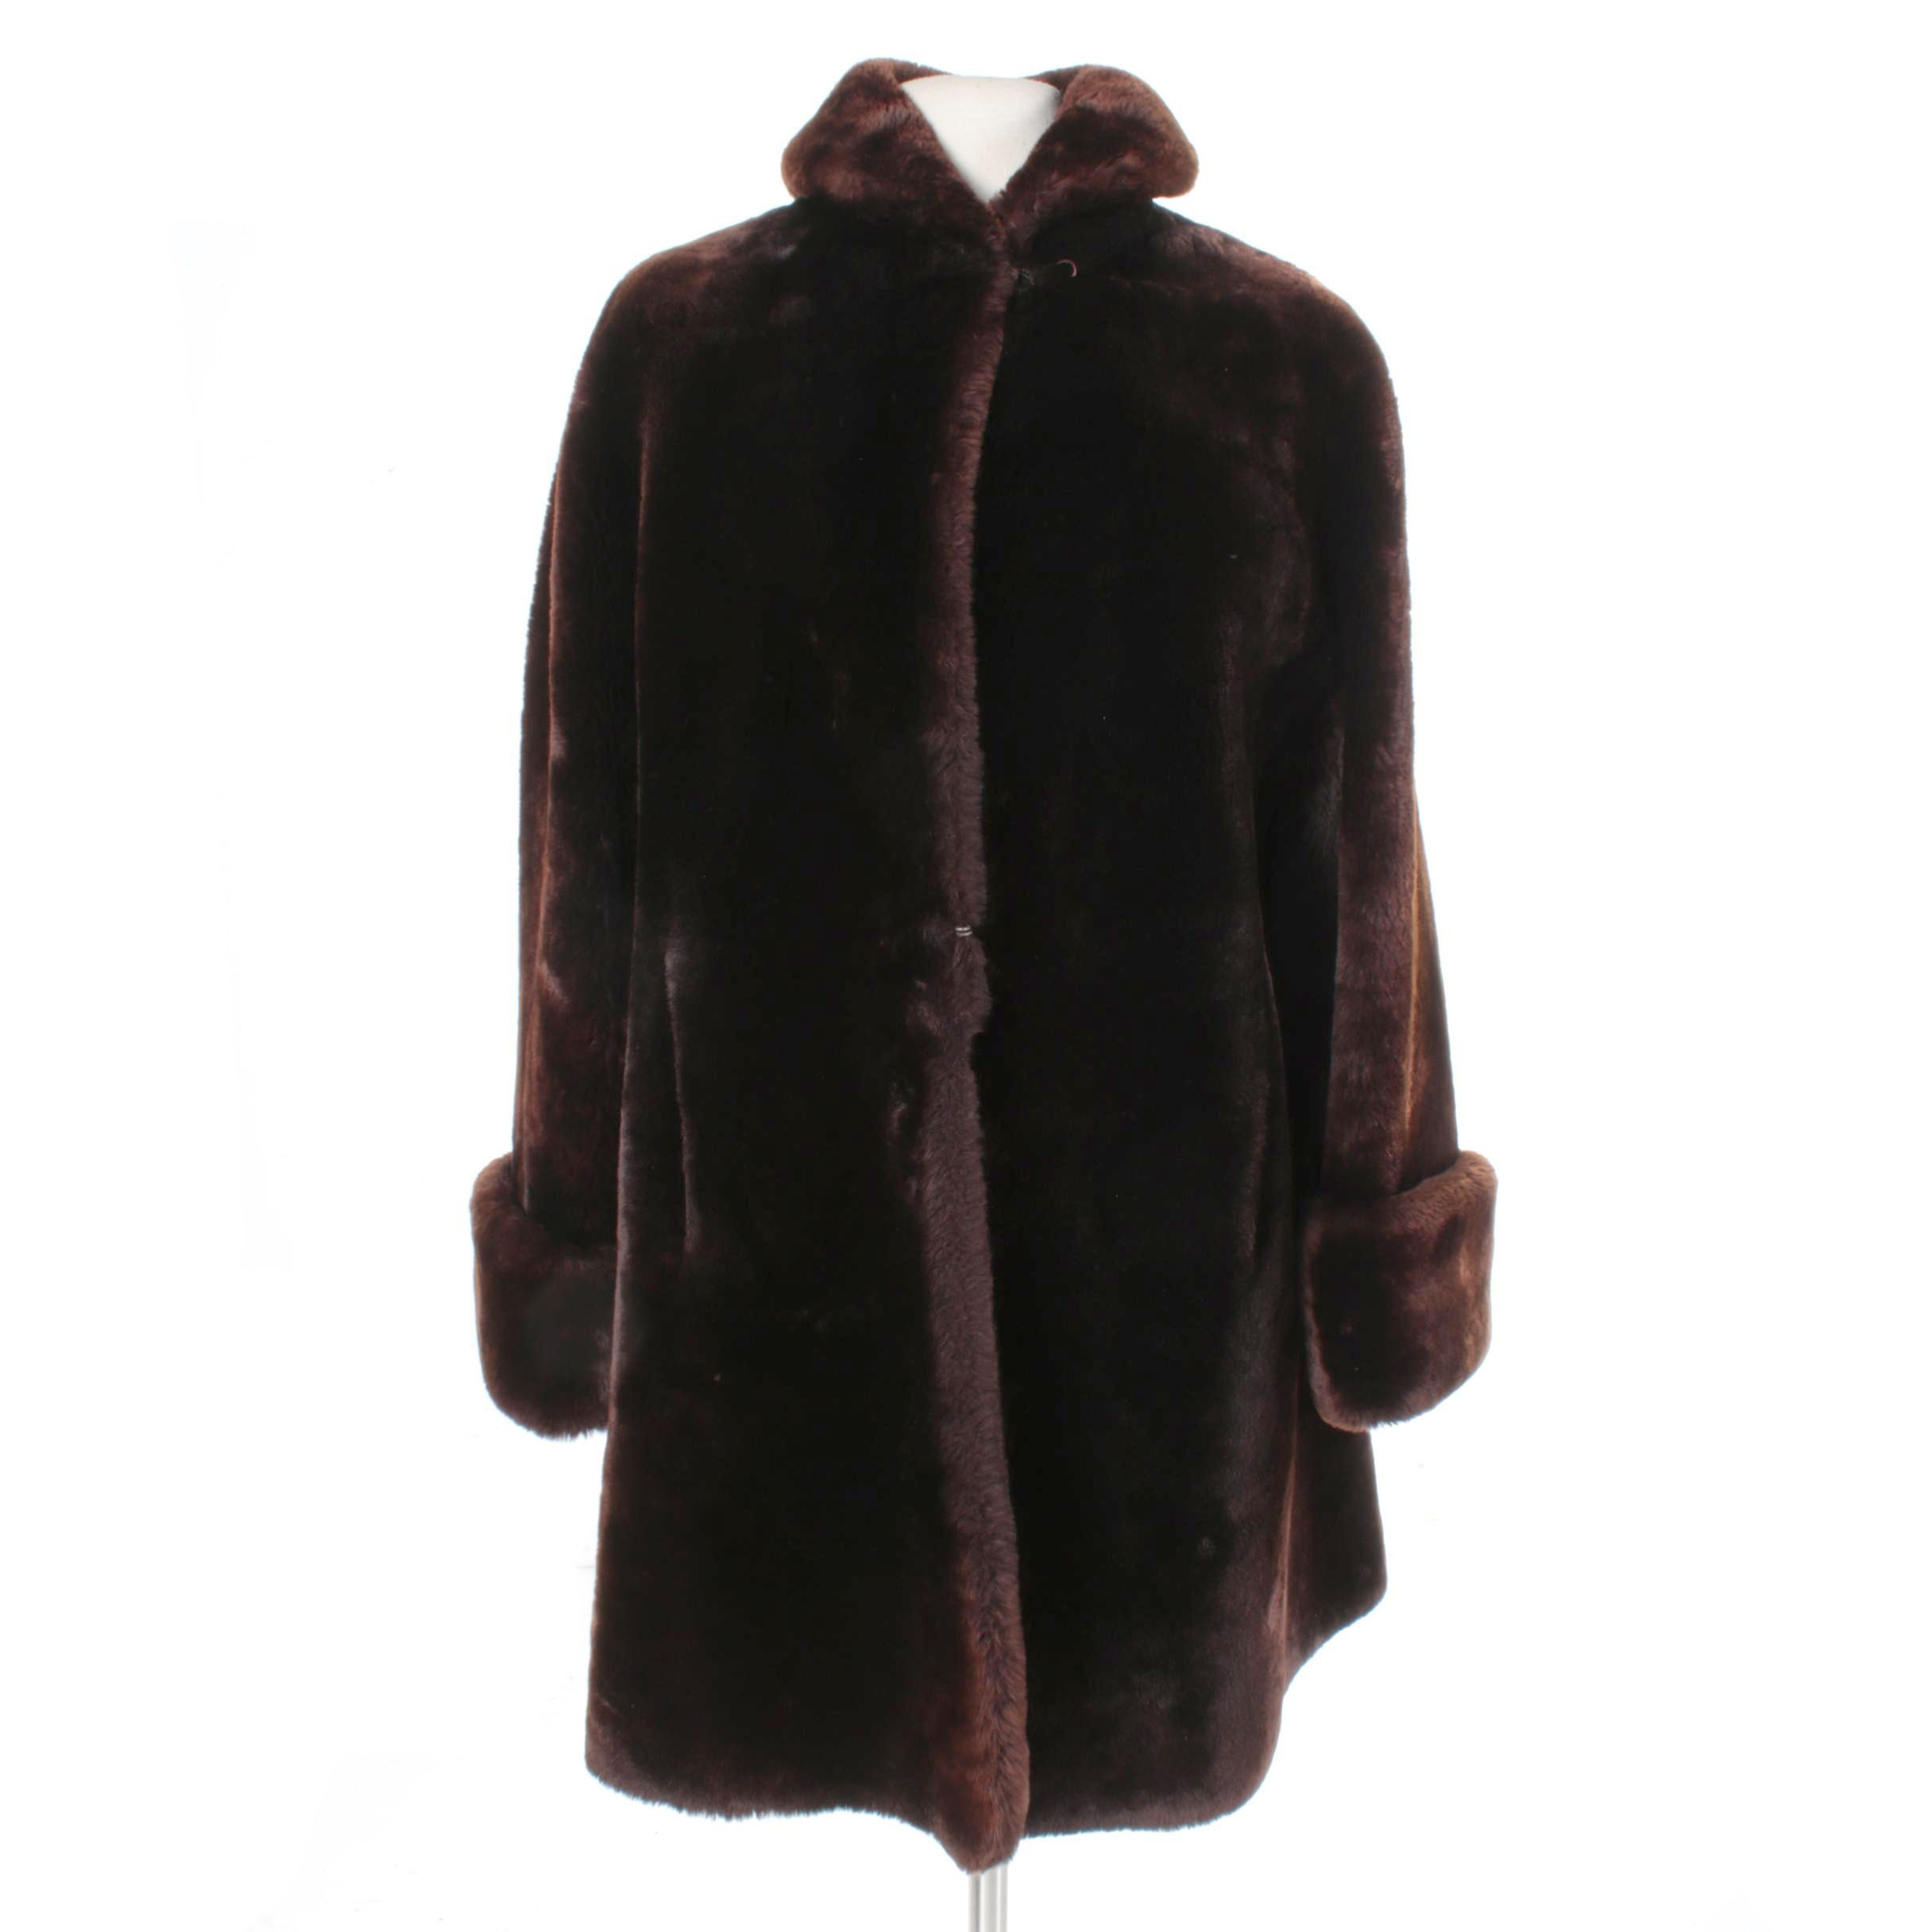 Vintage Brown Mouton Fur Coat